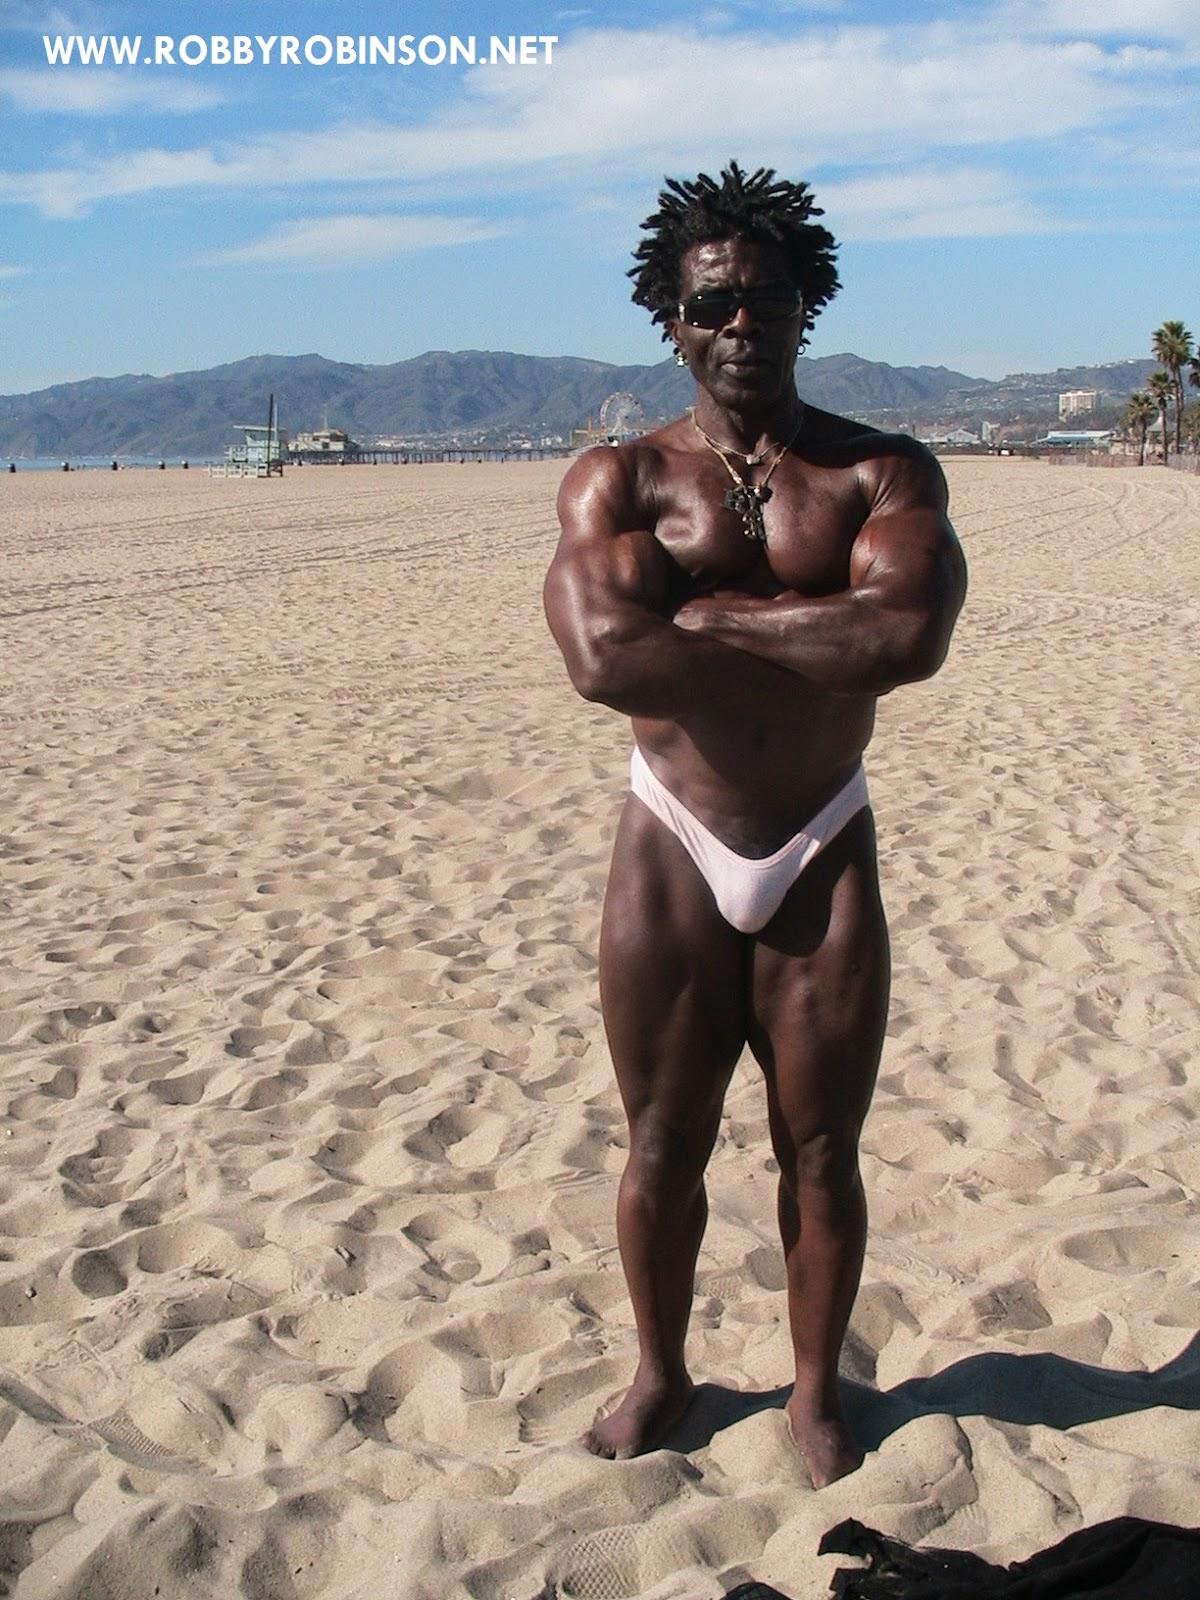 Robby Robinson - Weider Bust Pose, Venice Beach ● www.robbyrobinson.net/dvd_built.php ●